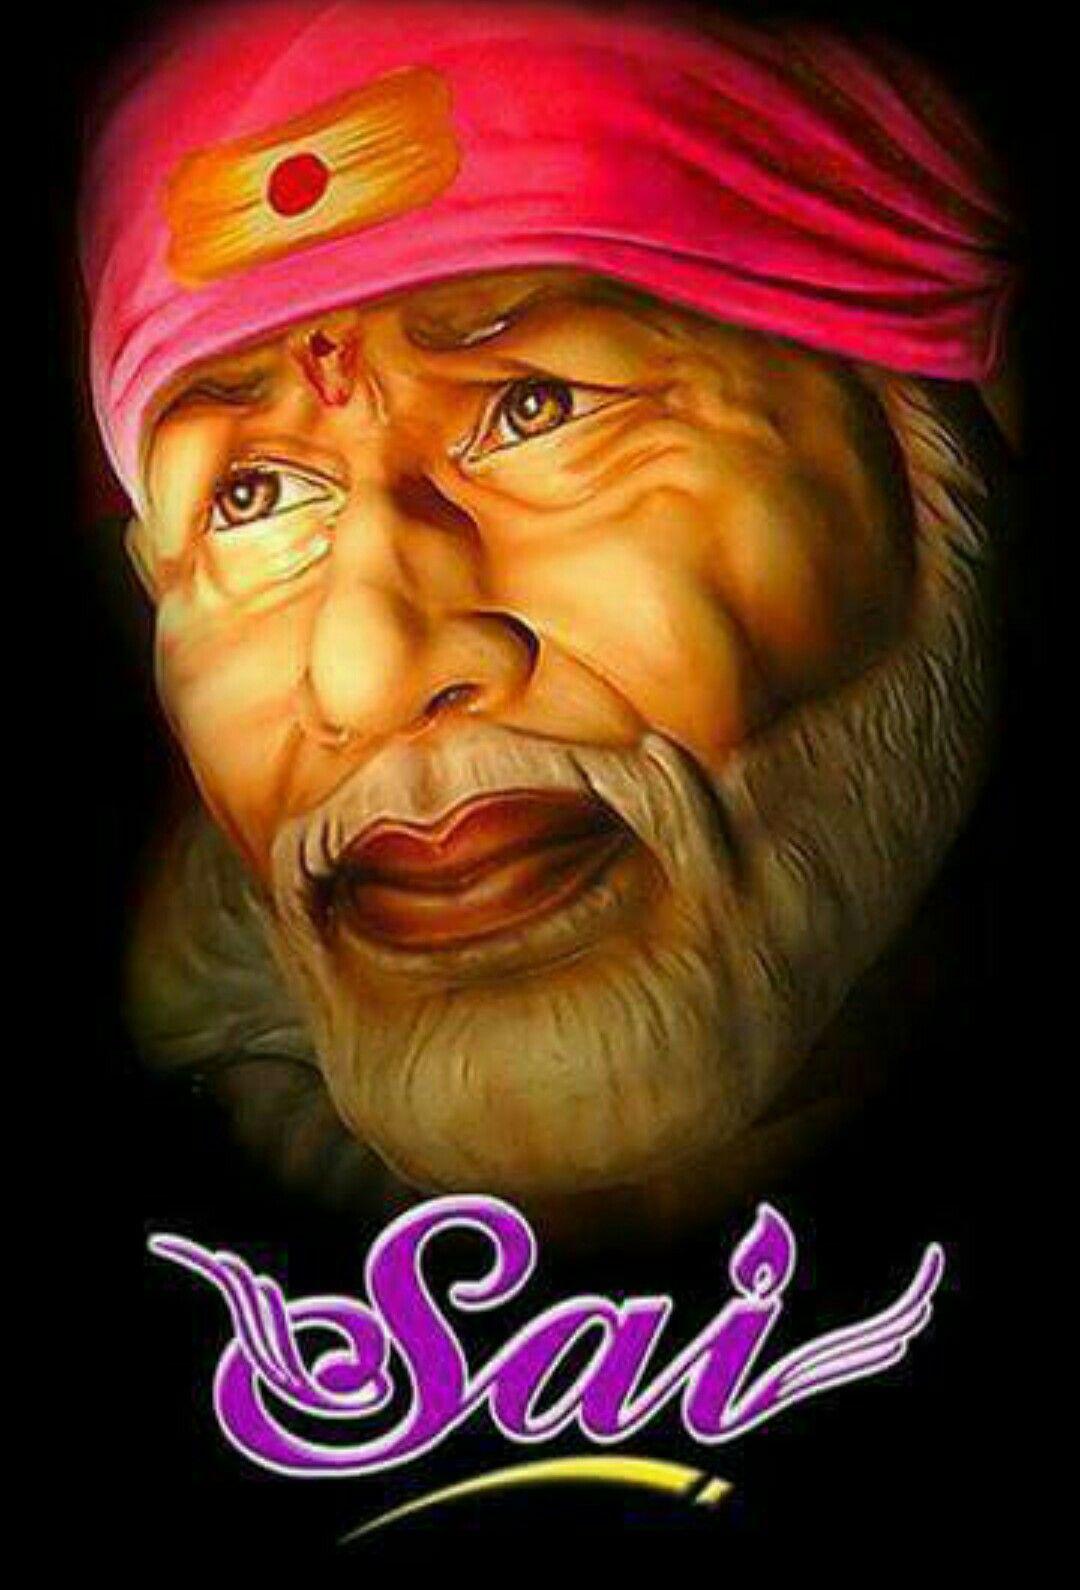 Om sai ram Faith Sai baba wallpapers Sai baba Sai baba pictures 1080x1590